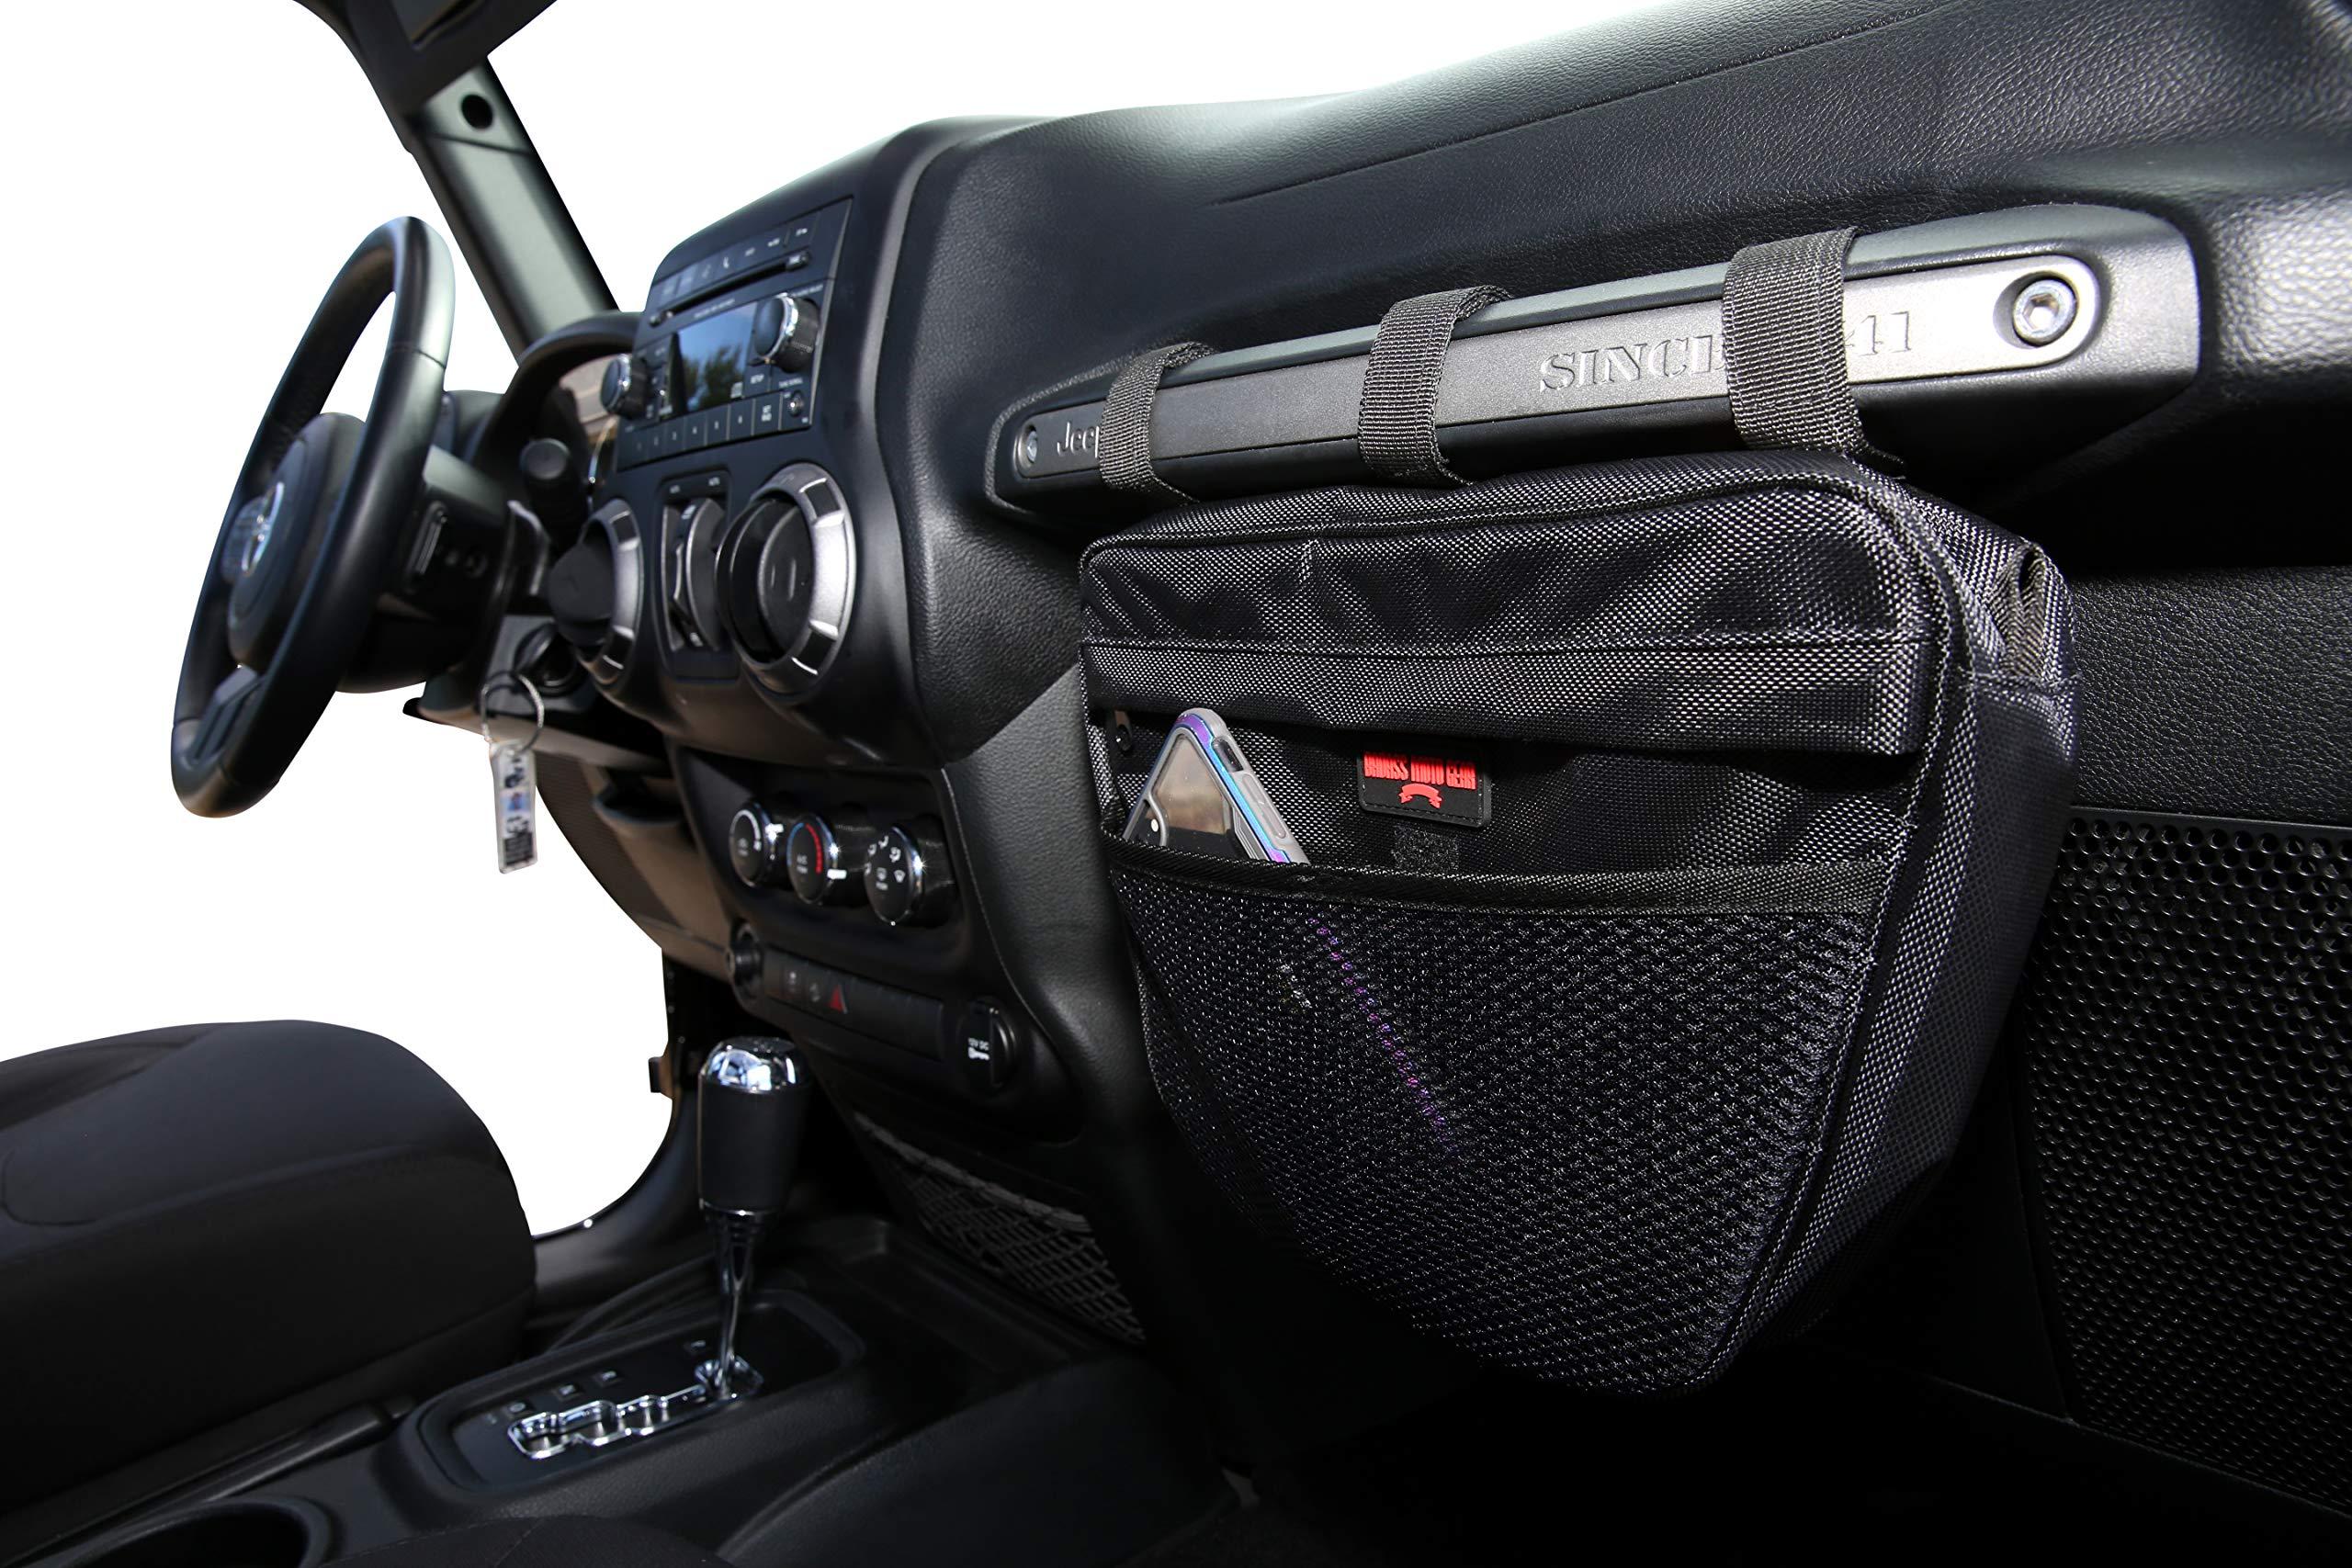 Badass Moto Gear Jeep Wrangler Storage Pouch. Waterproof Interior Accessories Organizer Bag Handles Phone, Sunglasses, Tools. EZ Access Mesh Pocket. Mount to Passenger Grab Handle. for JK TJ YJ CJ JL by Badass Motogear